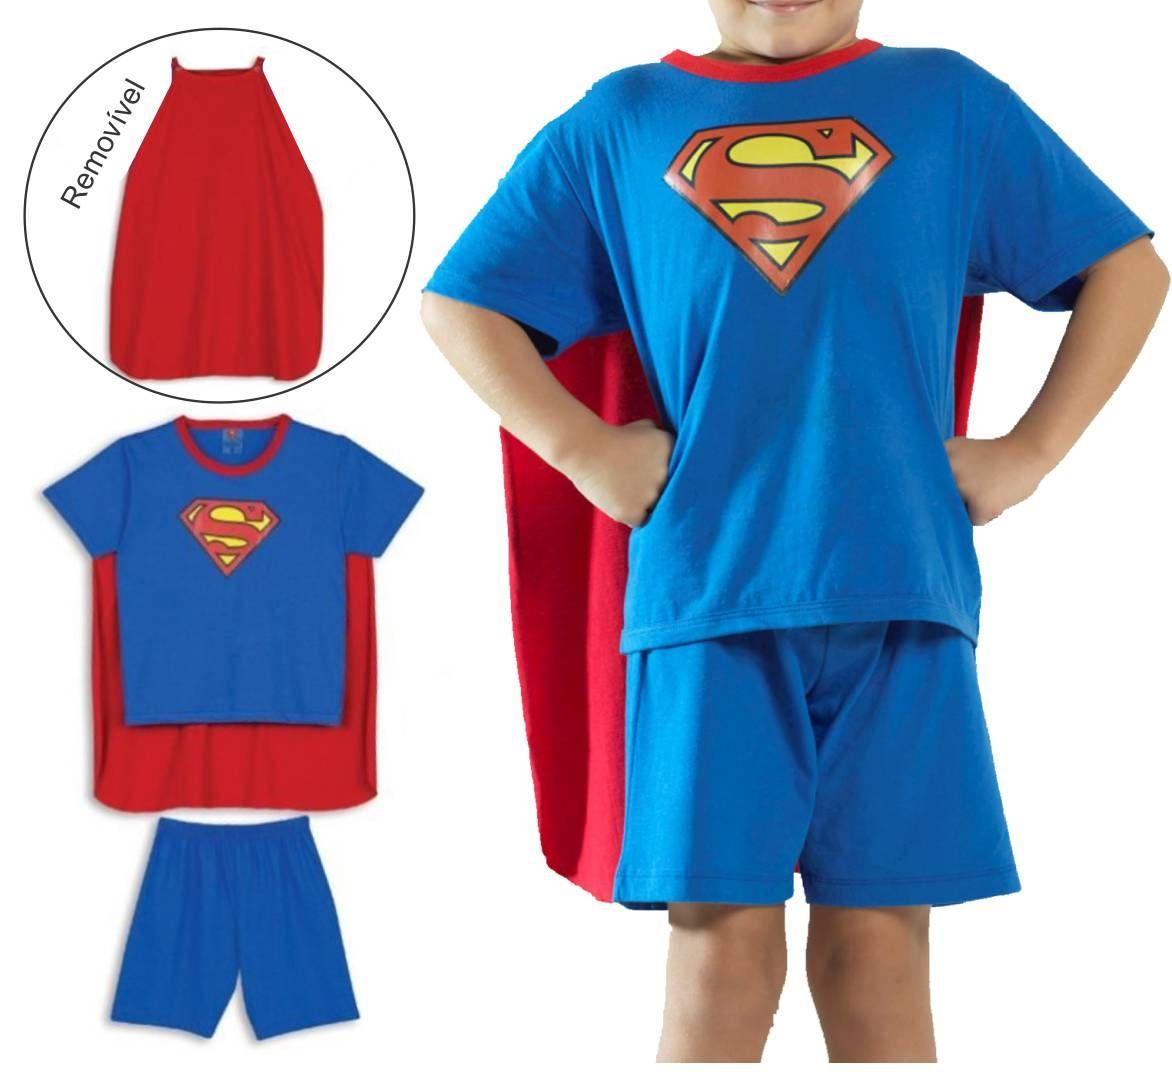 Fantasia Pijama Infantil Com Capa Lupo Super Homem Superman 23066-001